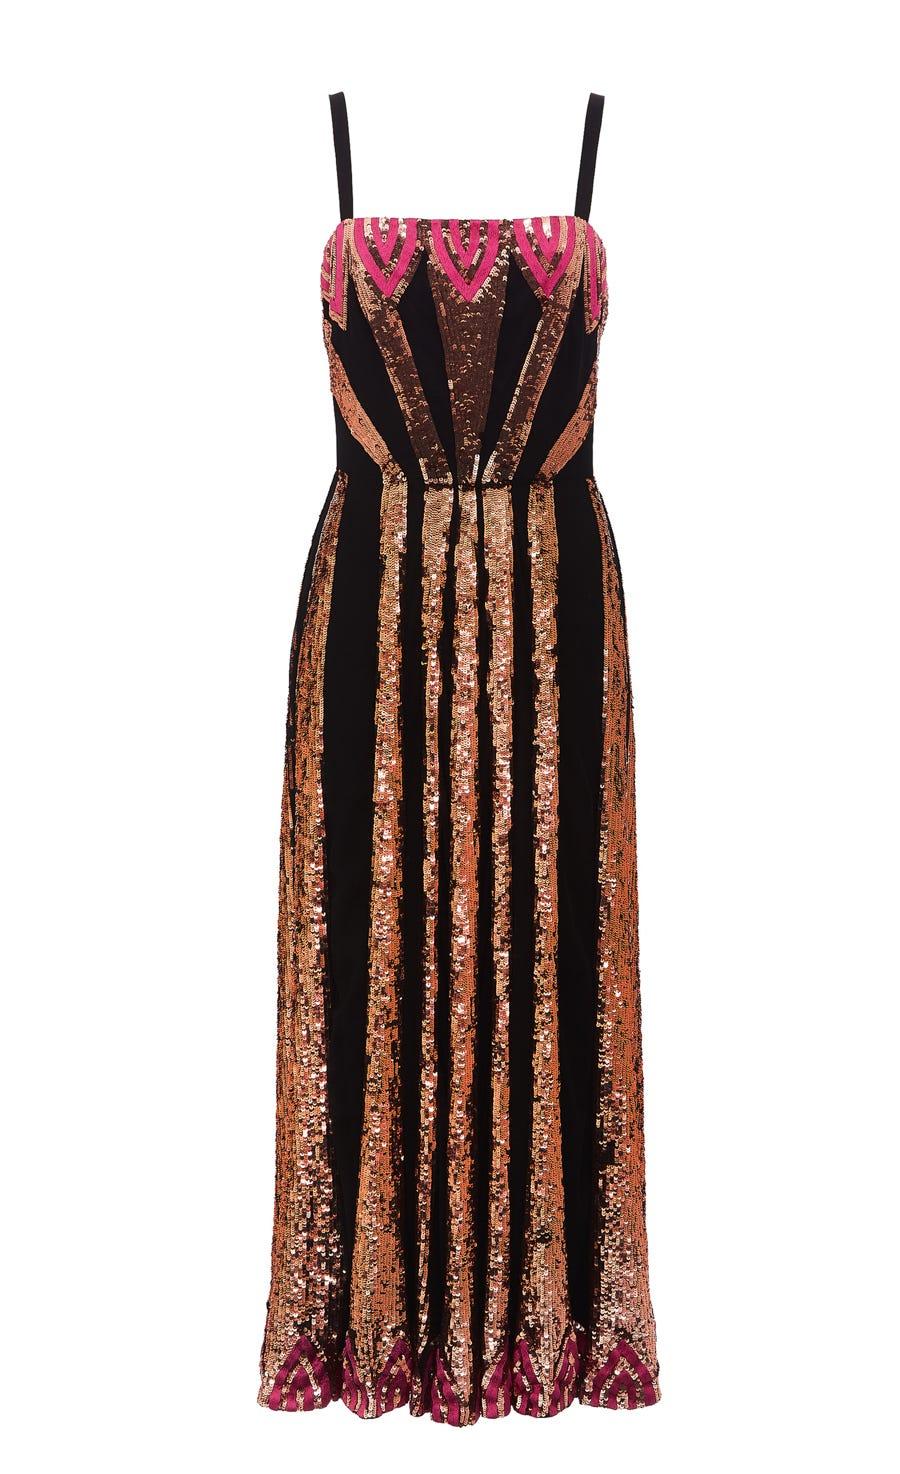 Sycamore Strappy Dress